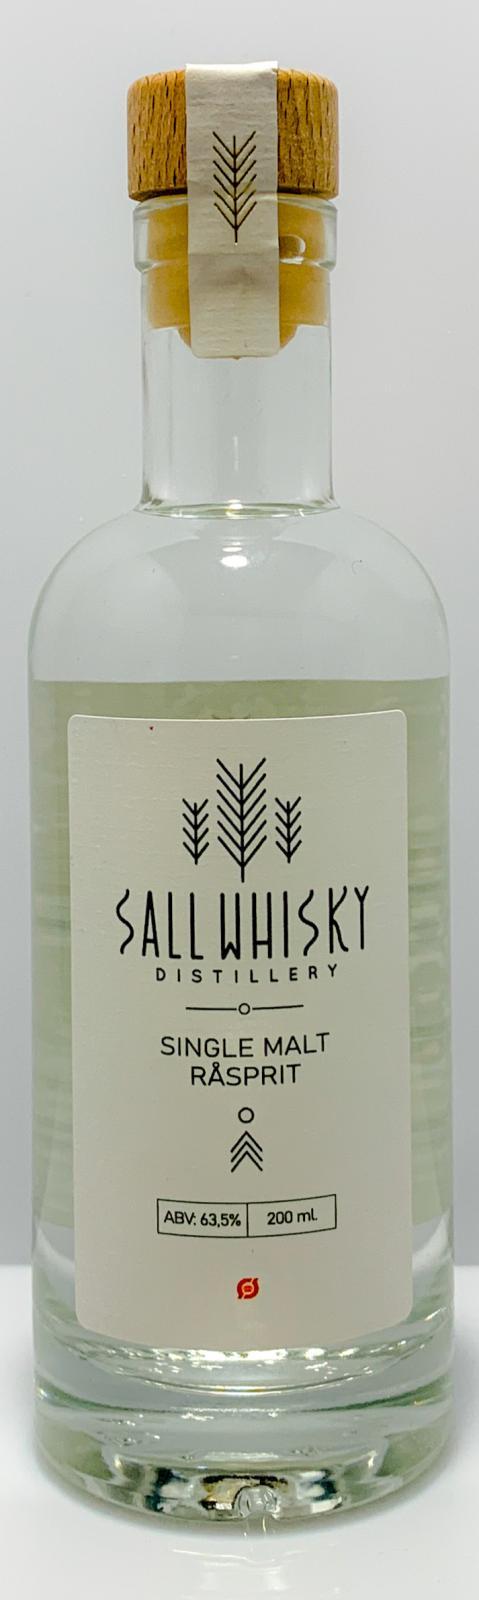 Sall Whisky 2020